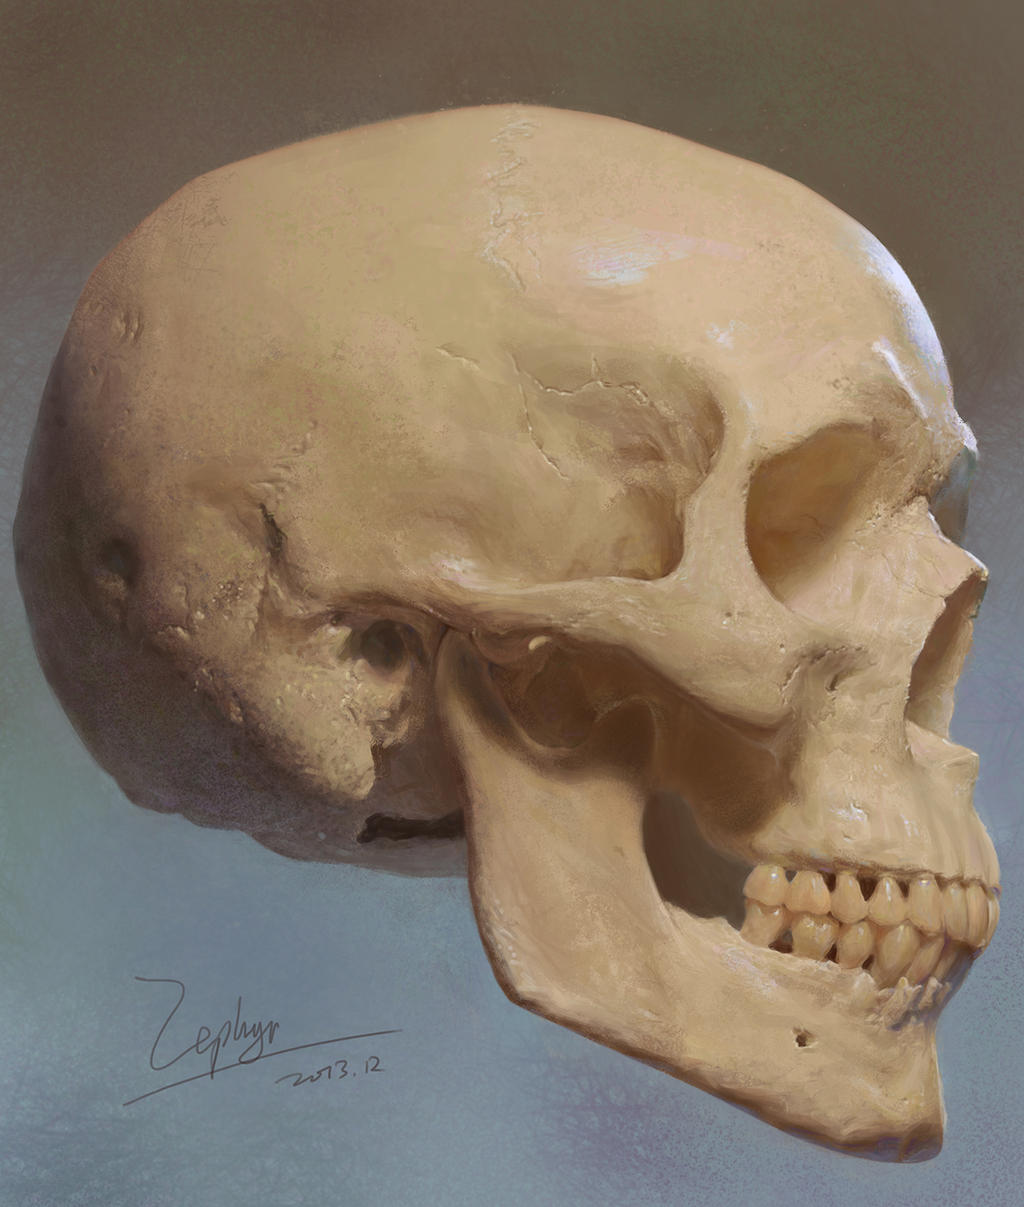 Skulls by zephyr0713